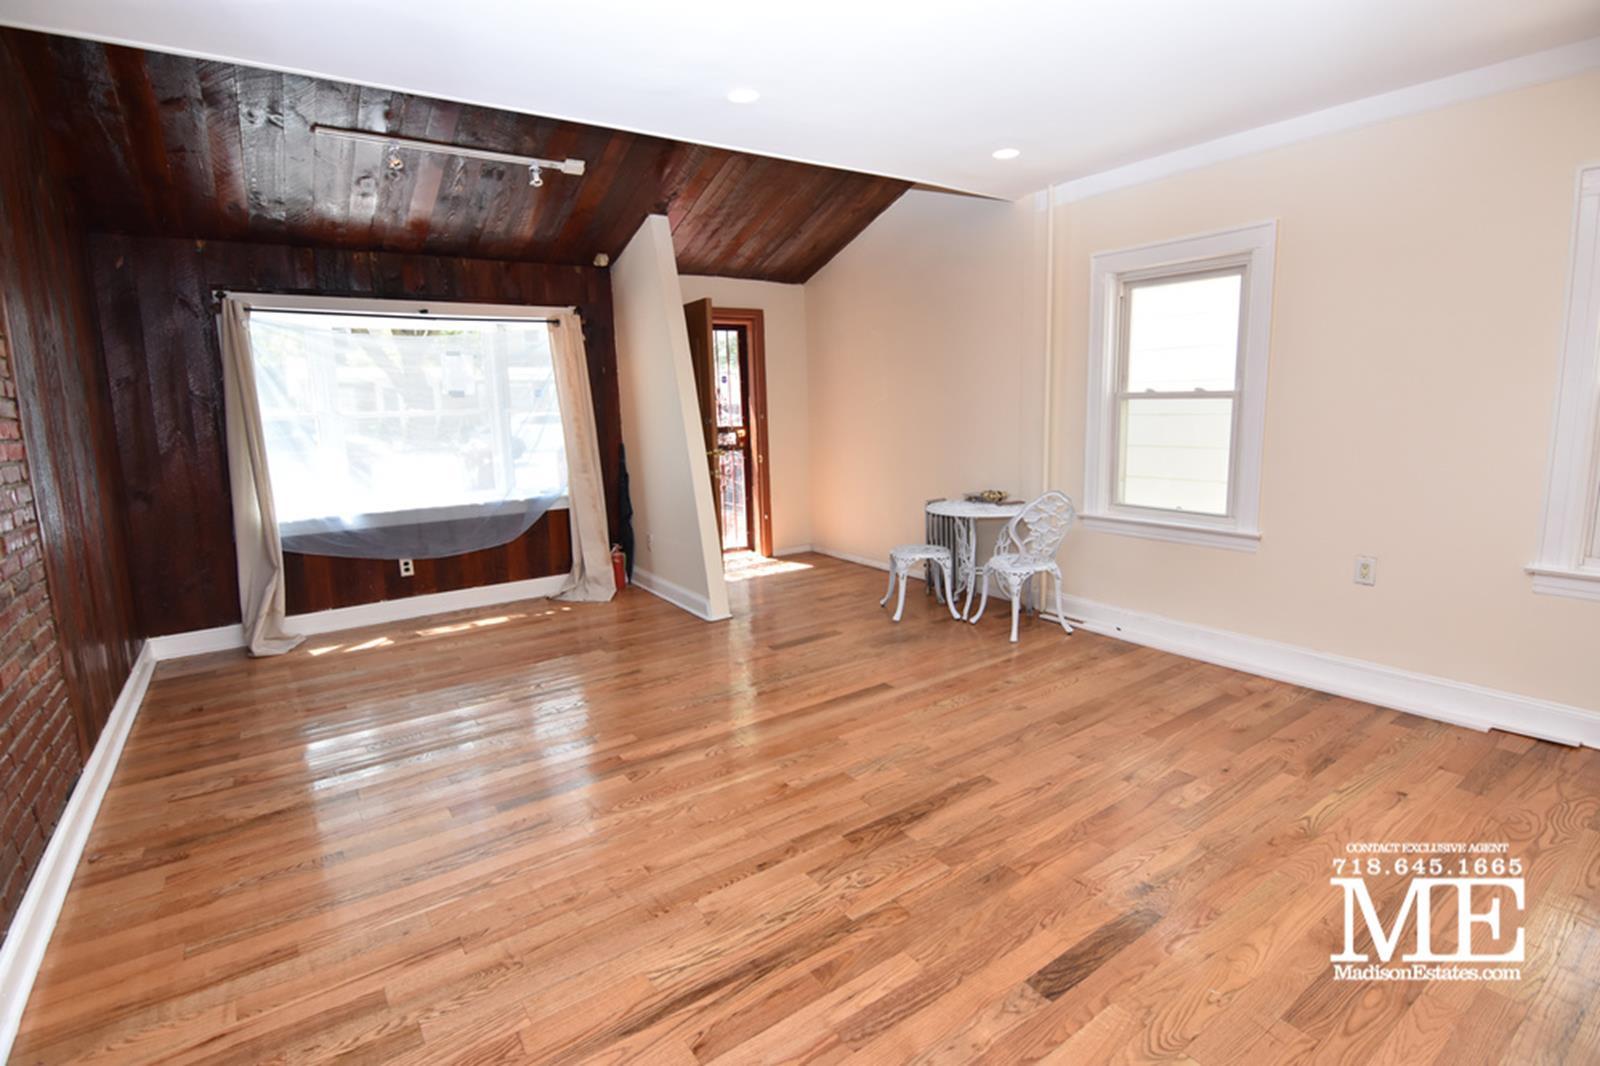 2037 East 55th Street Old Mill Basin Brooklyn NY 11234